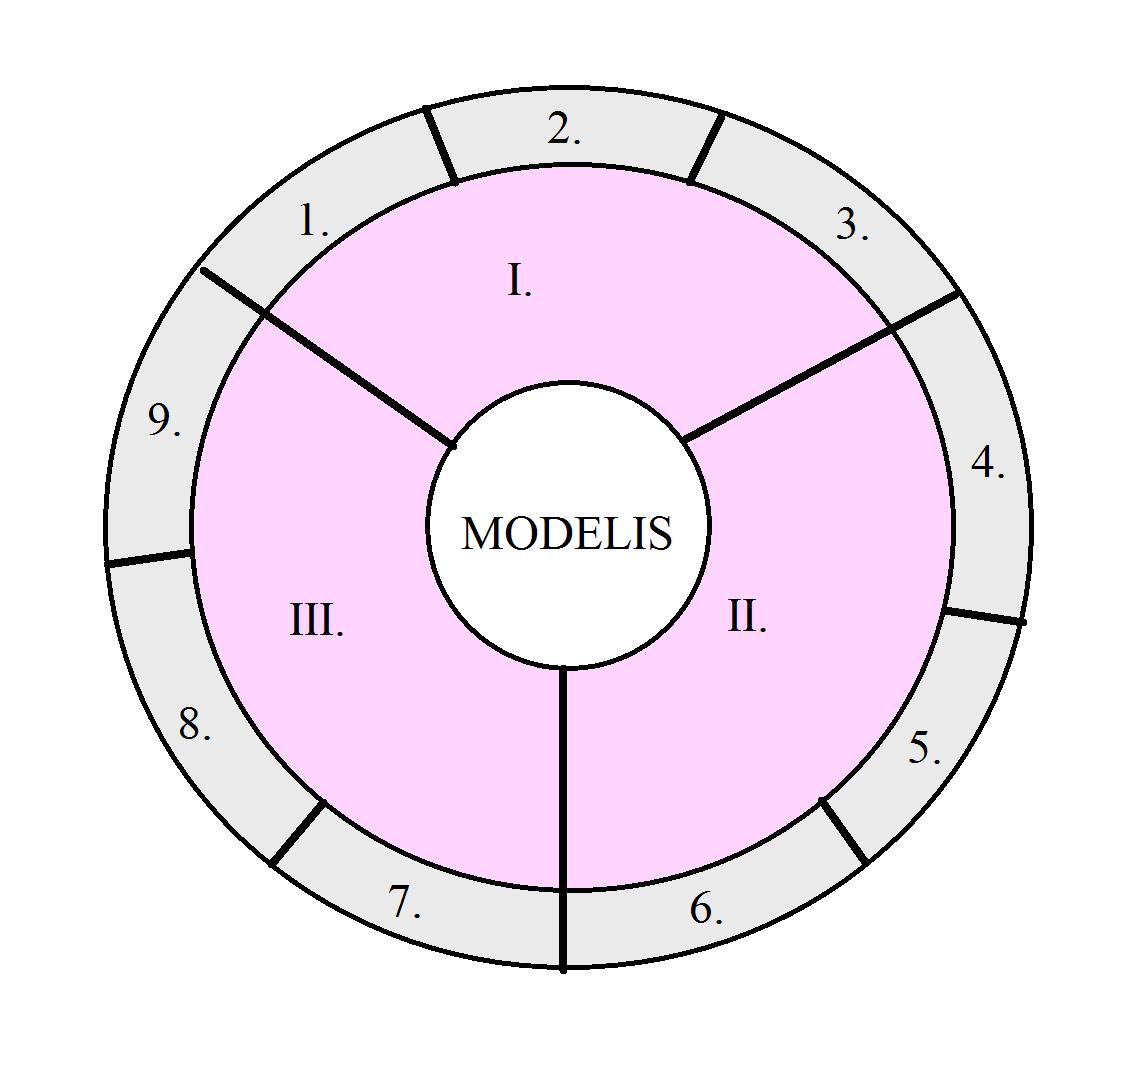 rato modelis